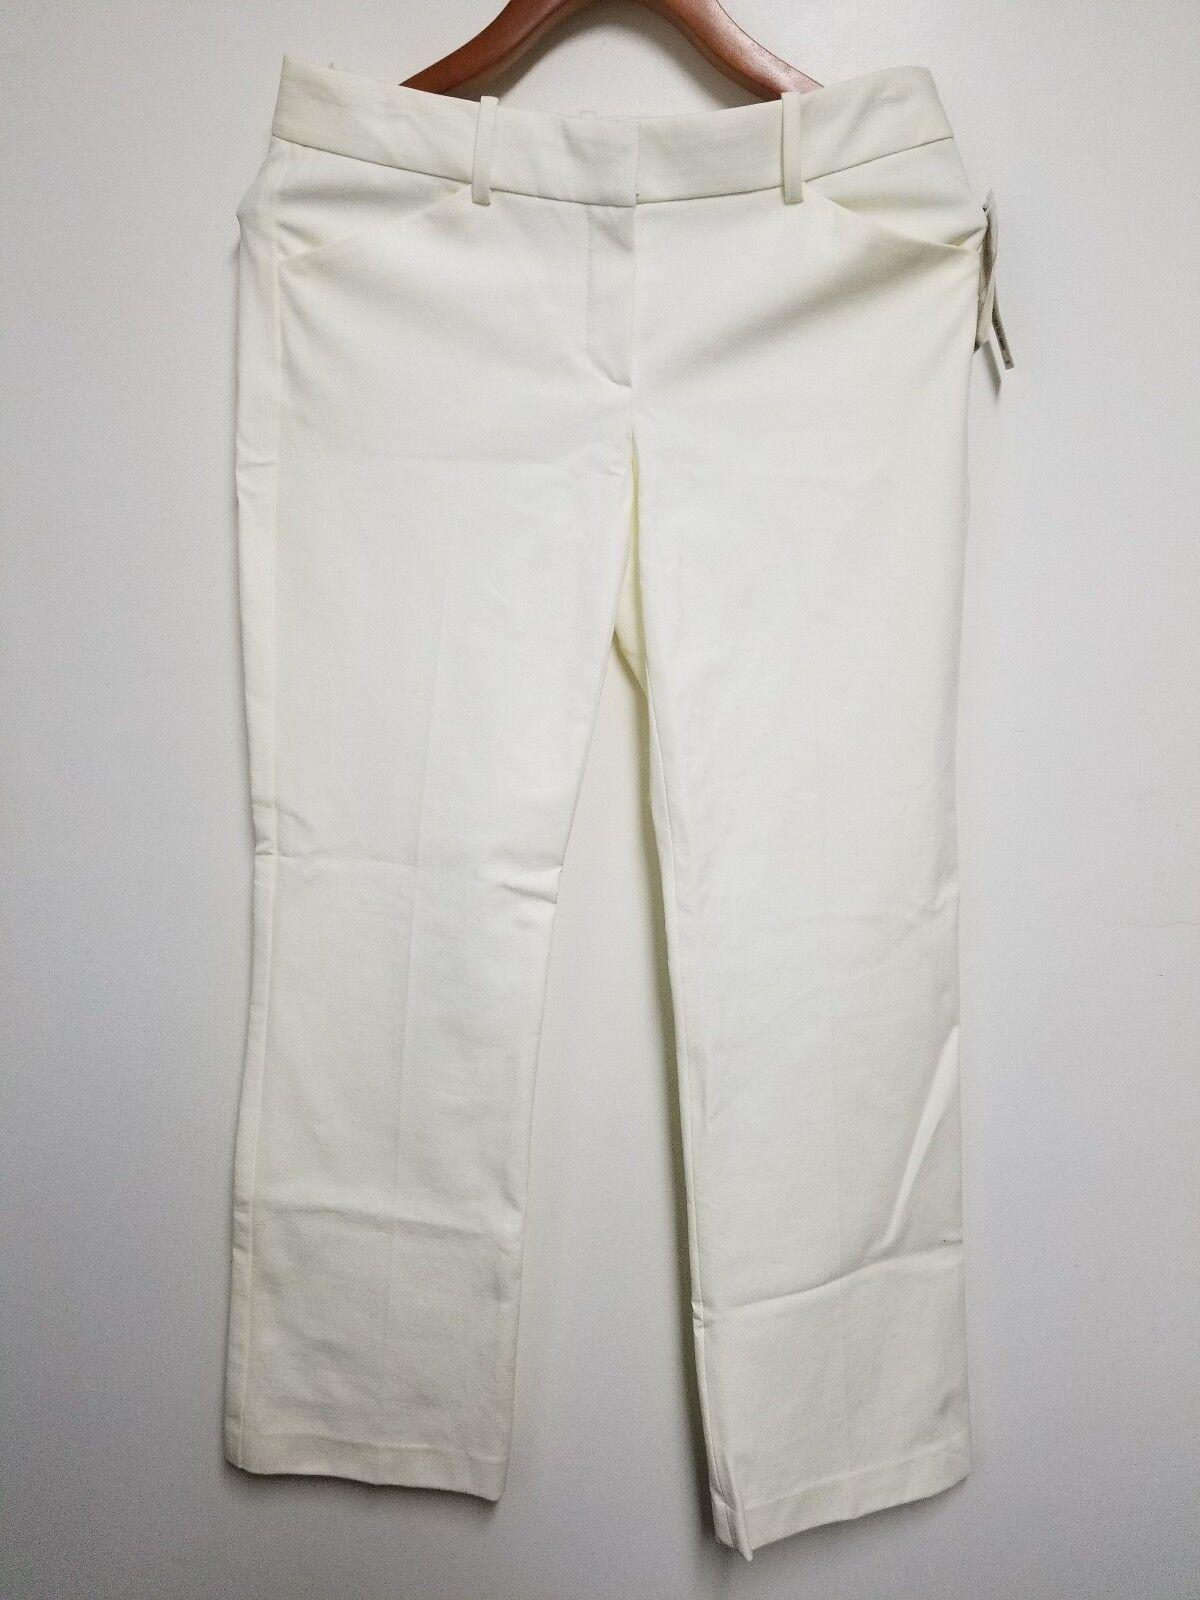 Theory Women's Ivory White Long Pants  235 - Size 4